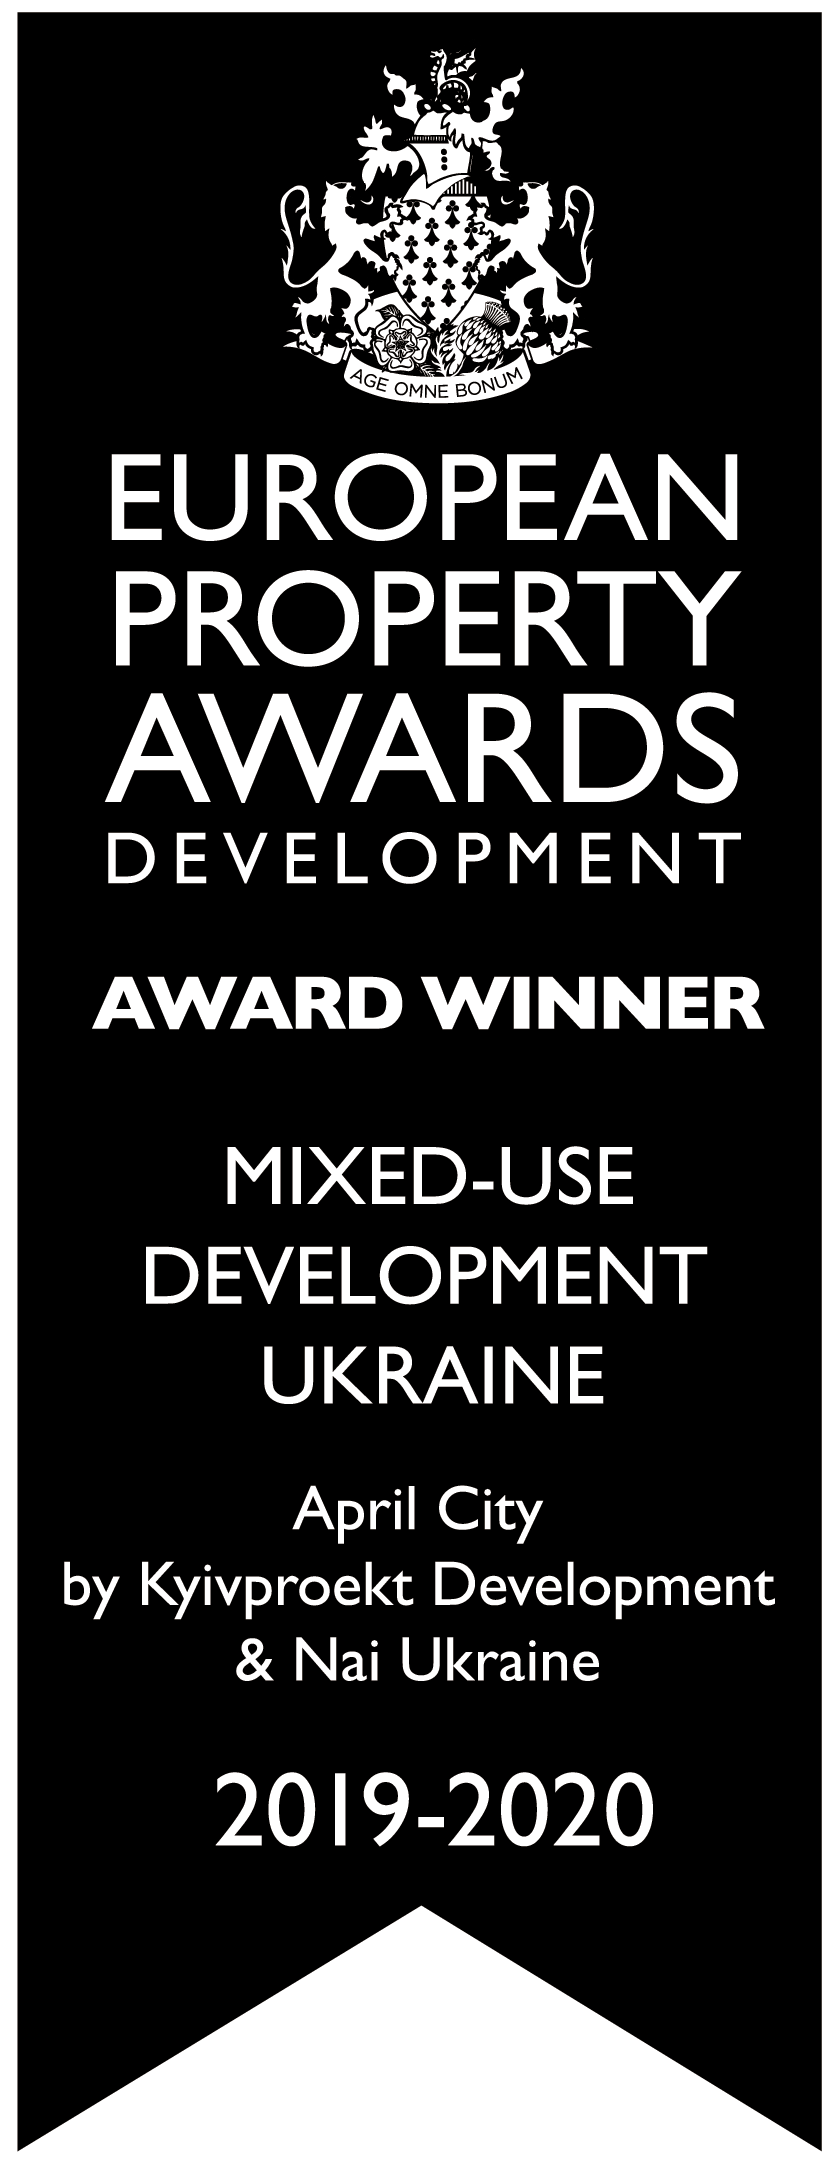 European property awards 2019-2020